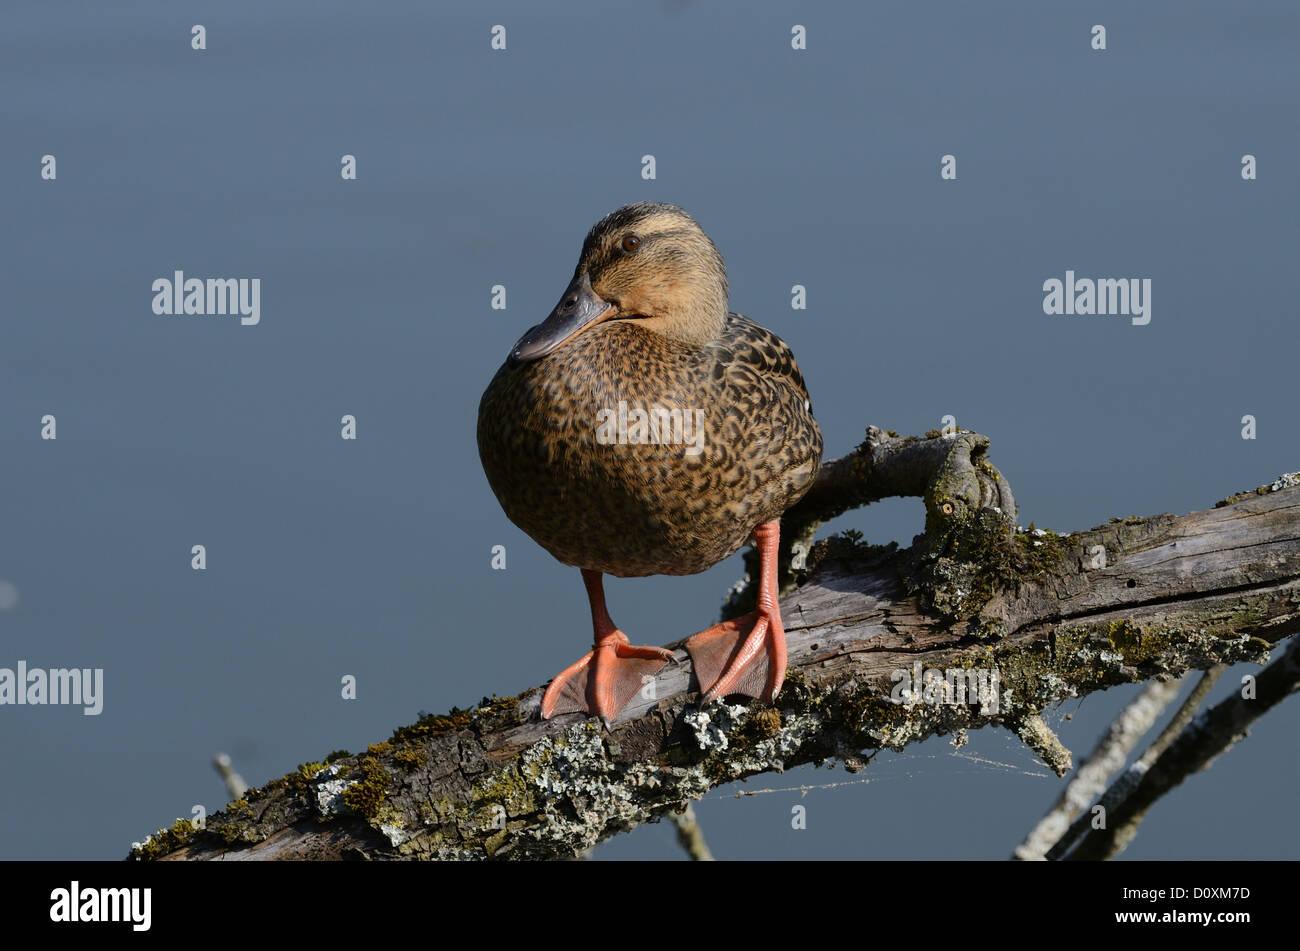 Mallard, Anas platyrhynchos, Anatidae, female, duck, bird, animal, dam, Klingnau, Canton, Argovie, Switzerland - Stock Image